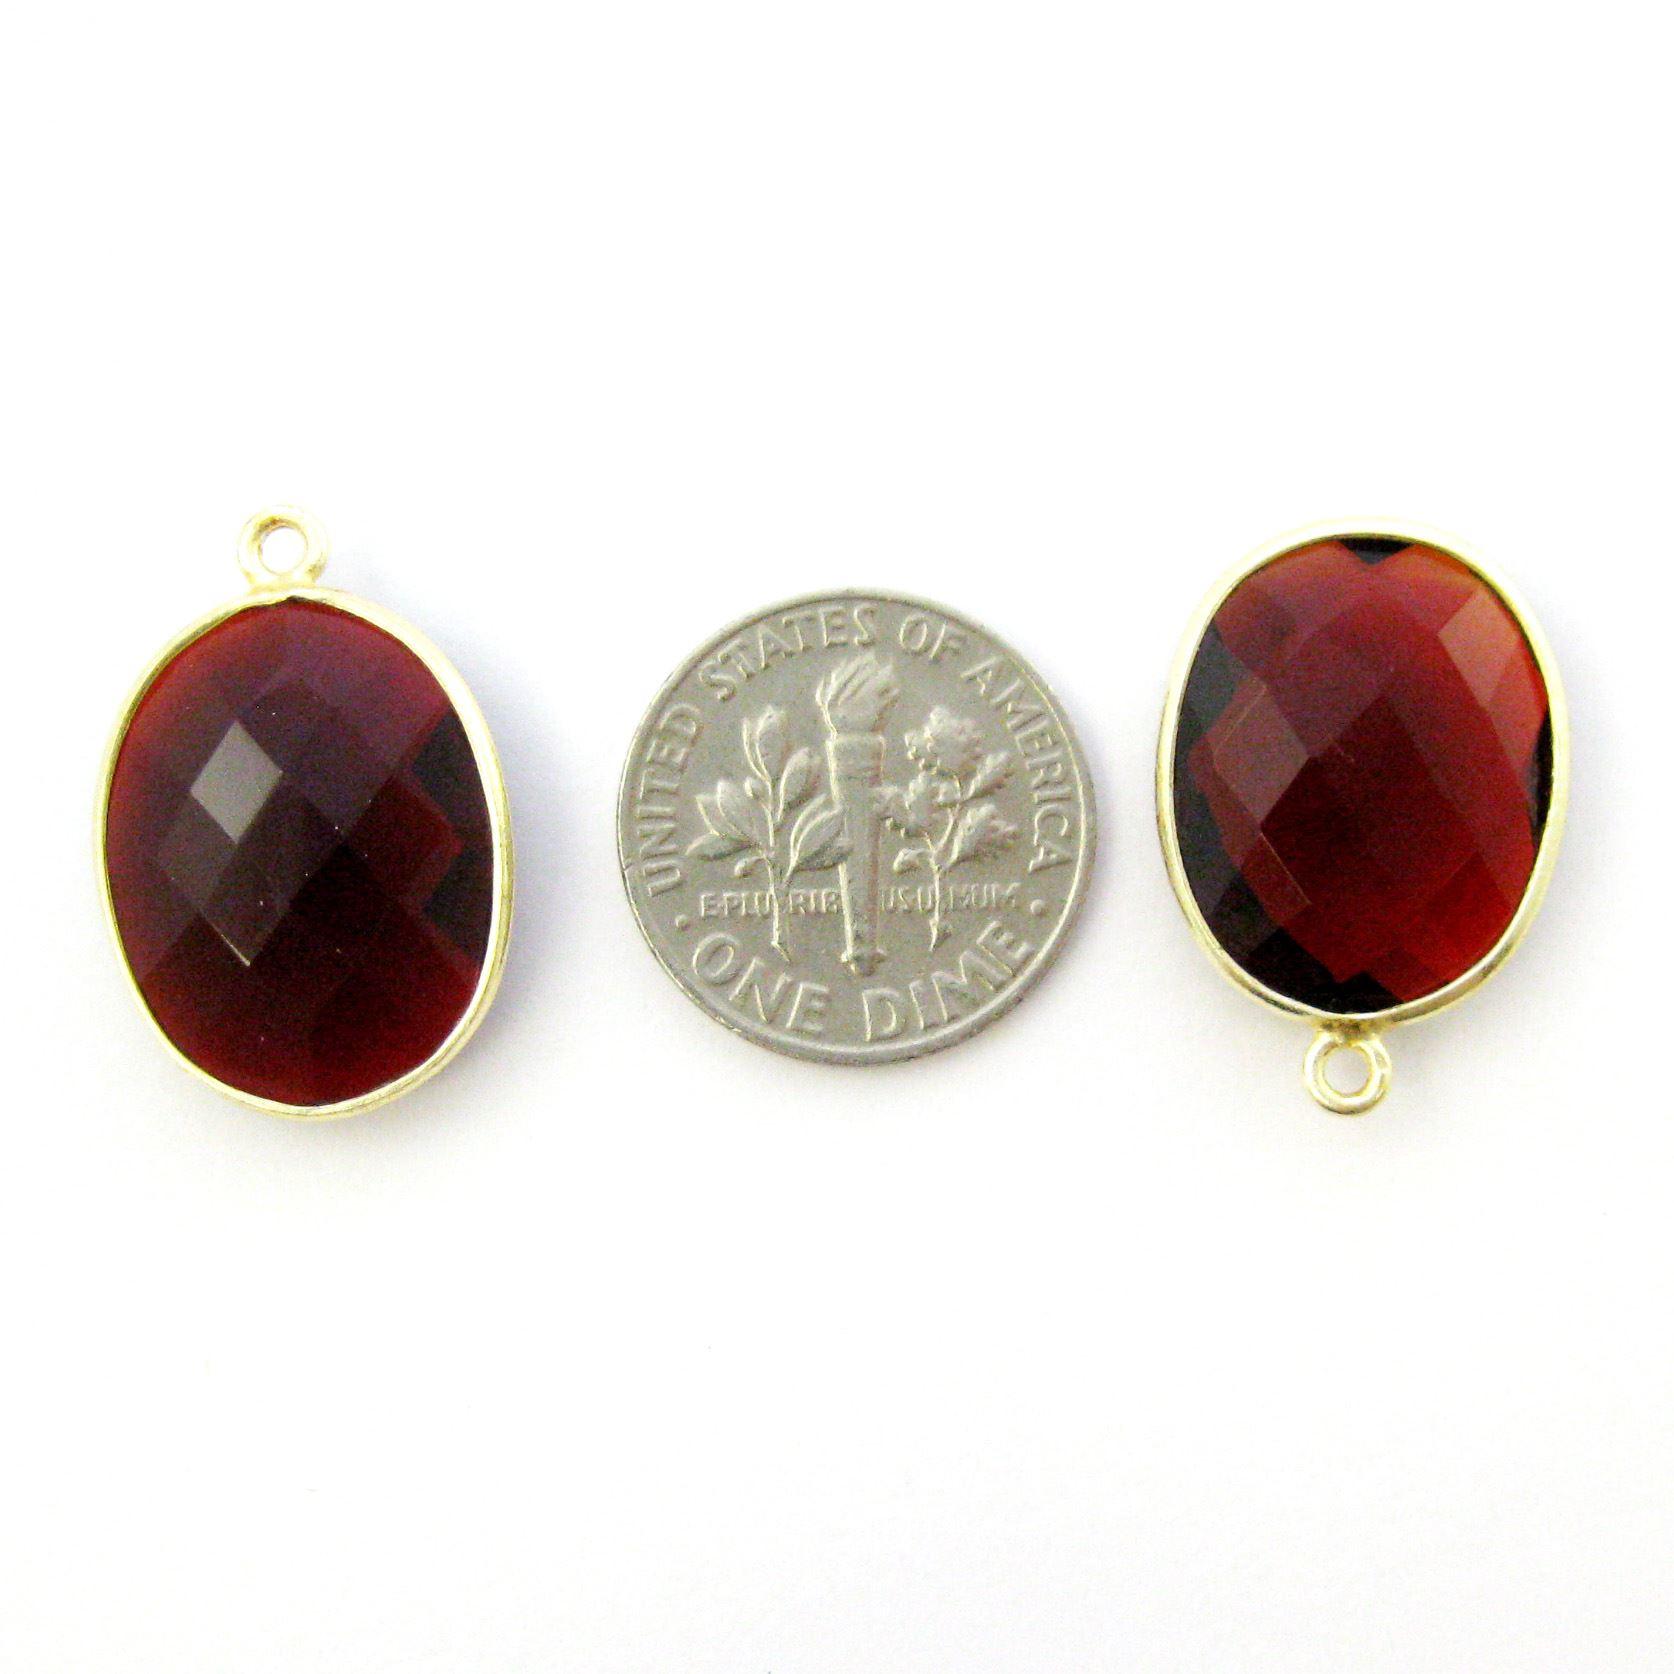 Bezel Gemstone Pendant - 14x18mm Faceted Oval - Garnet Quartz (Sold per 2 pieces)